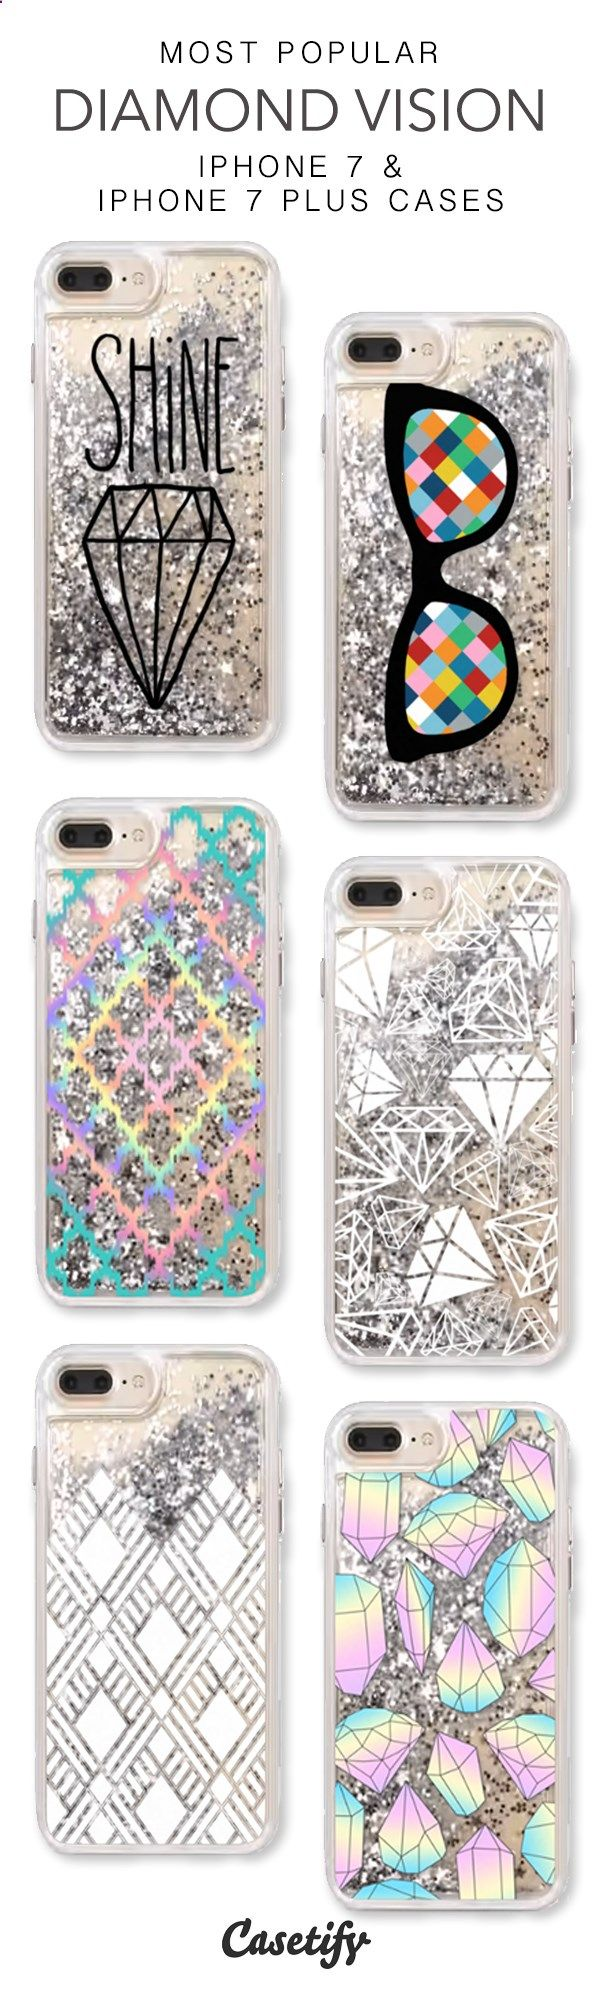 Most Popular Diamond Vision iPhone 7 Cases & iPhone 7 Plus Cases. More liquid glitter iPhone case here > www.casetify.com/...